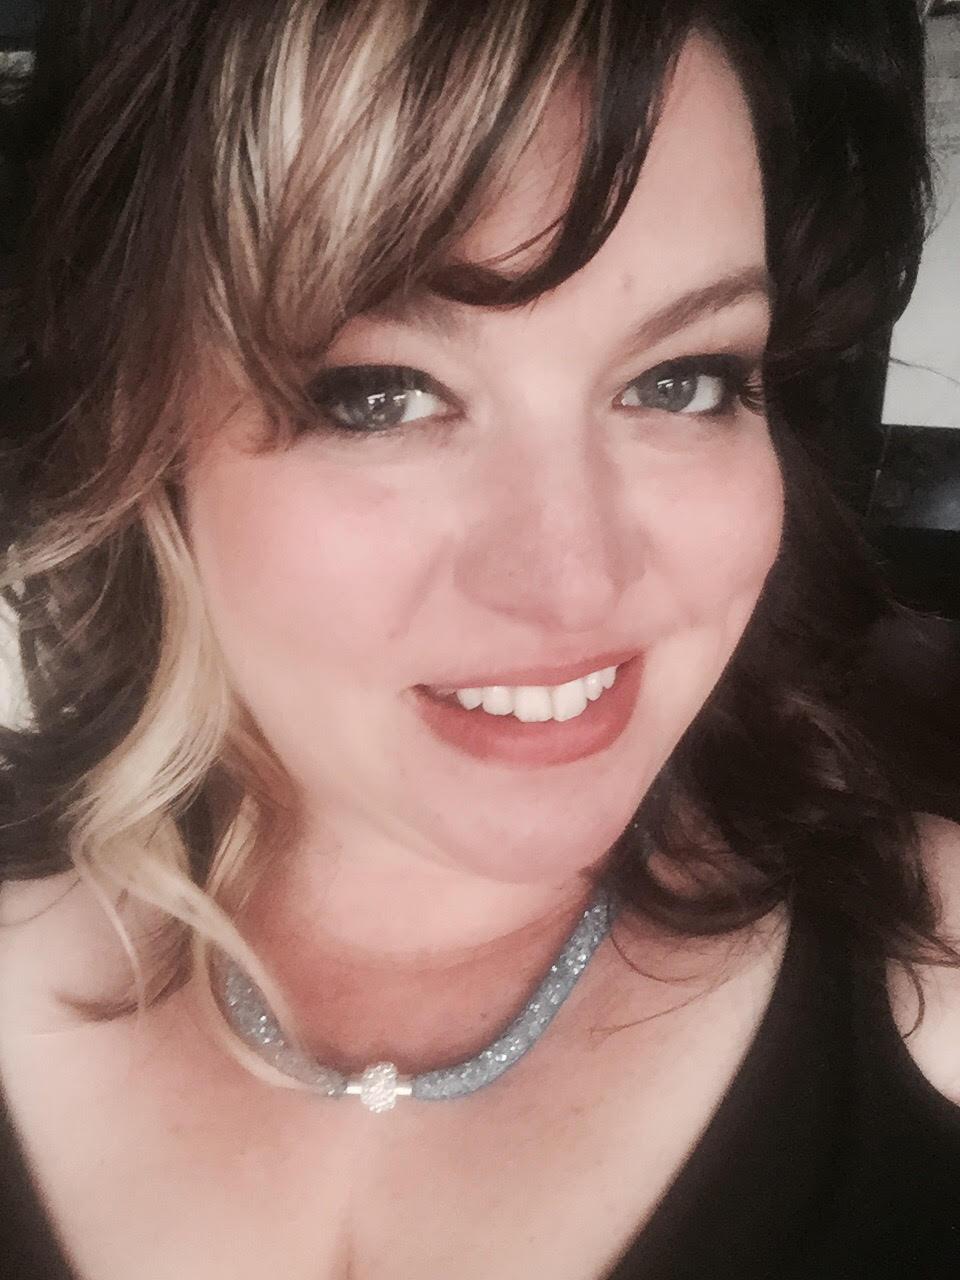 Saskatoon dating online